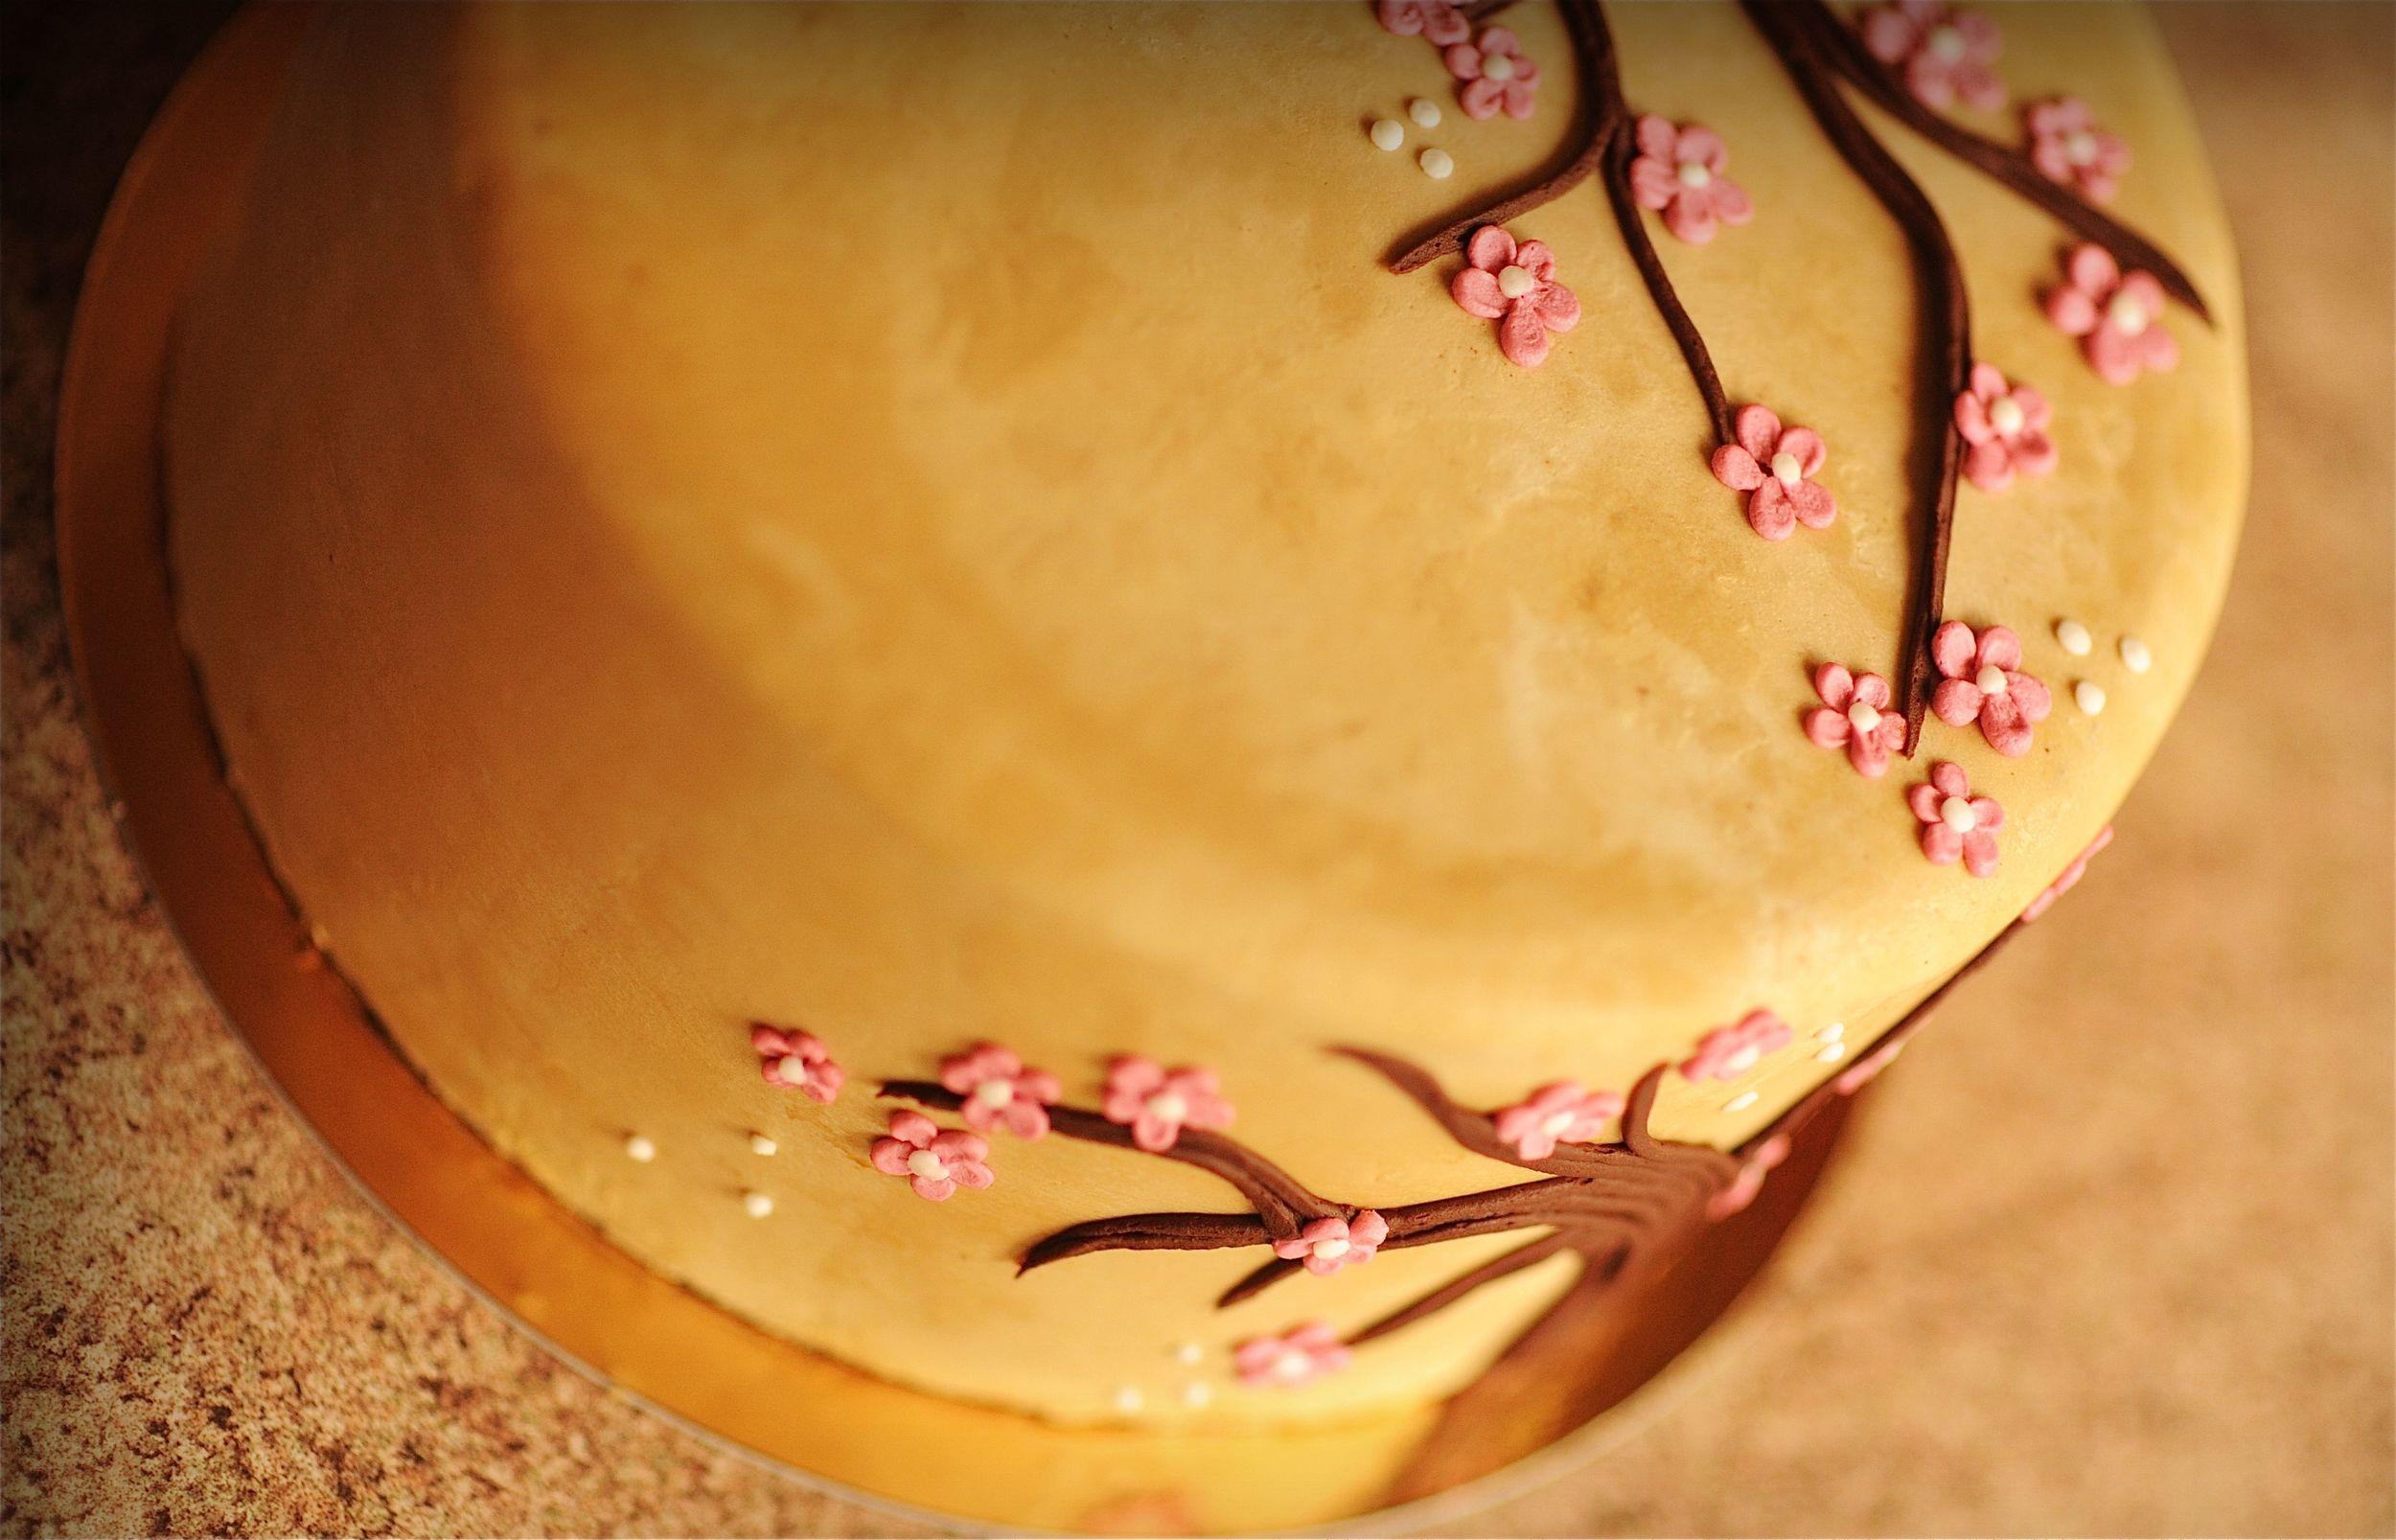 CU40 blossom.jpg